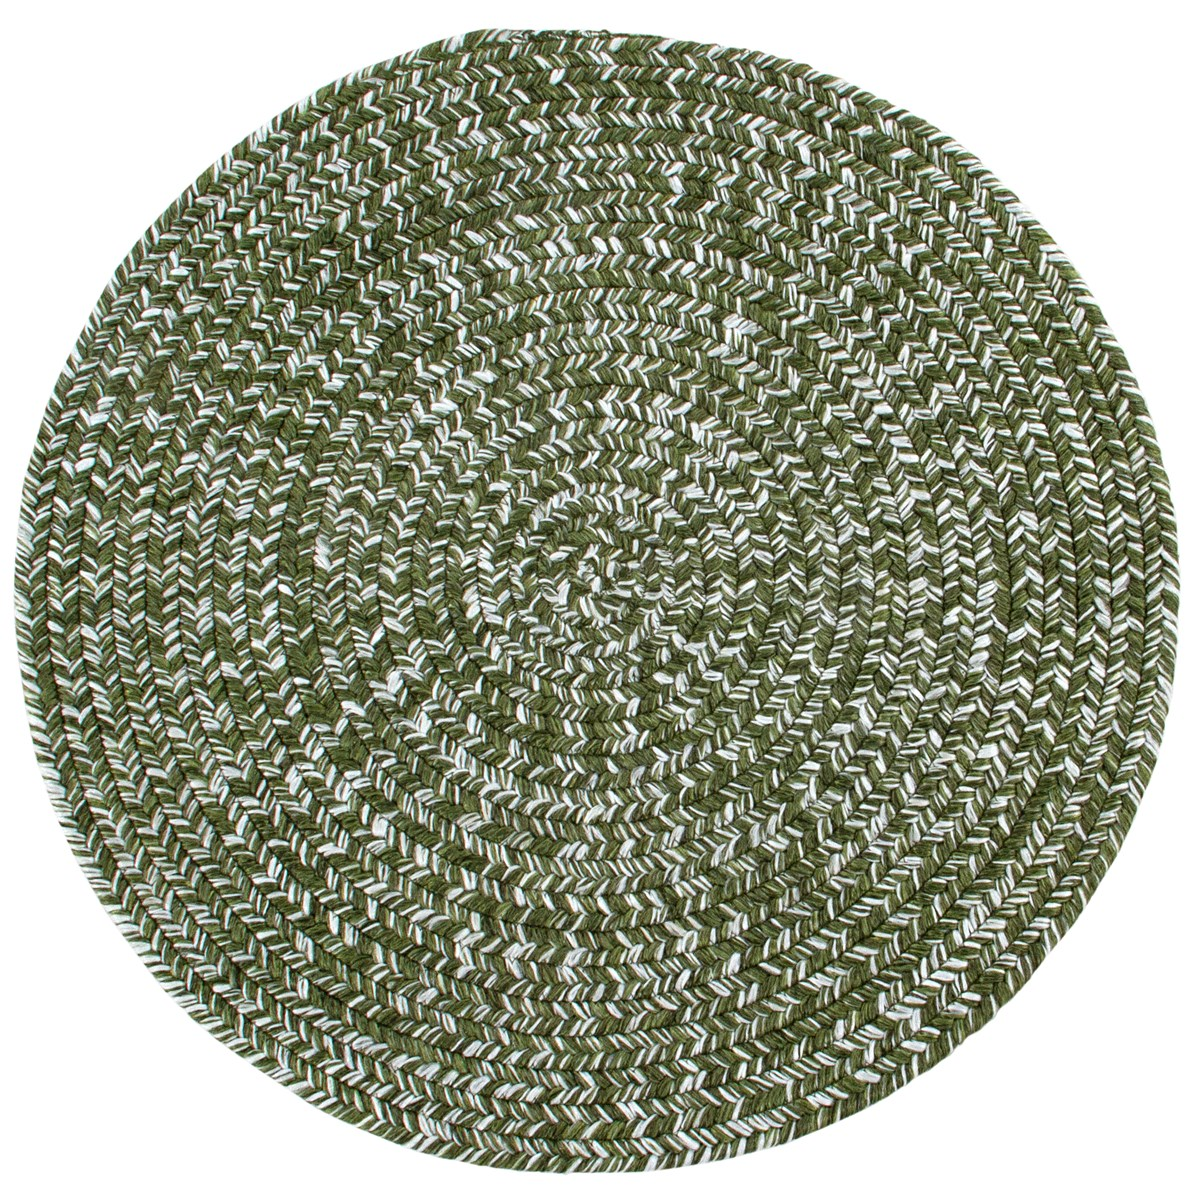 Tapis de salon en Polypropylène Vert olive 120x120 cm